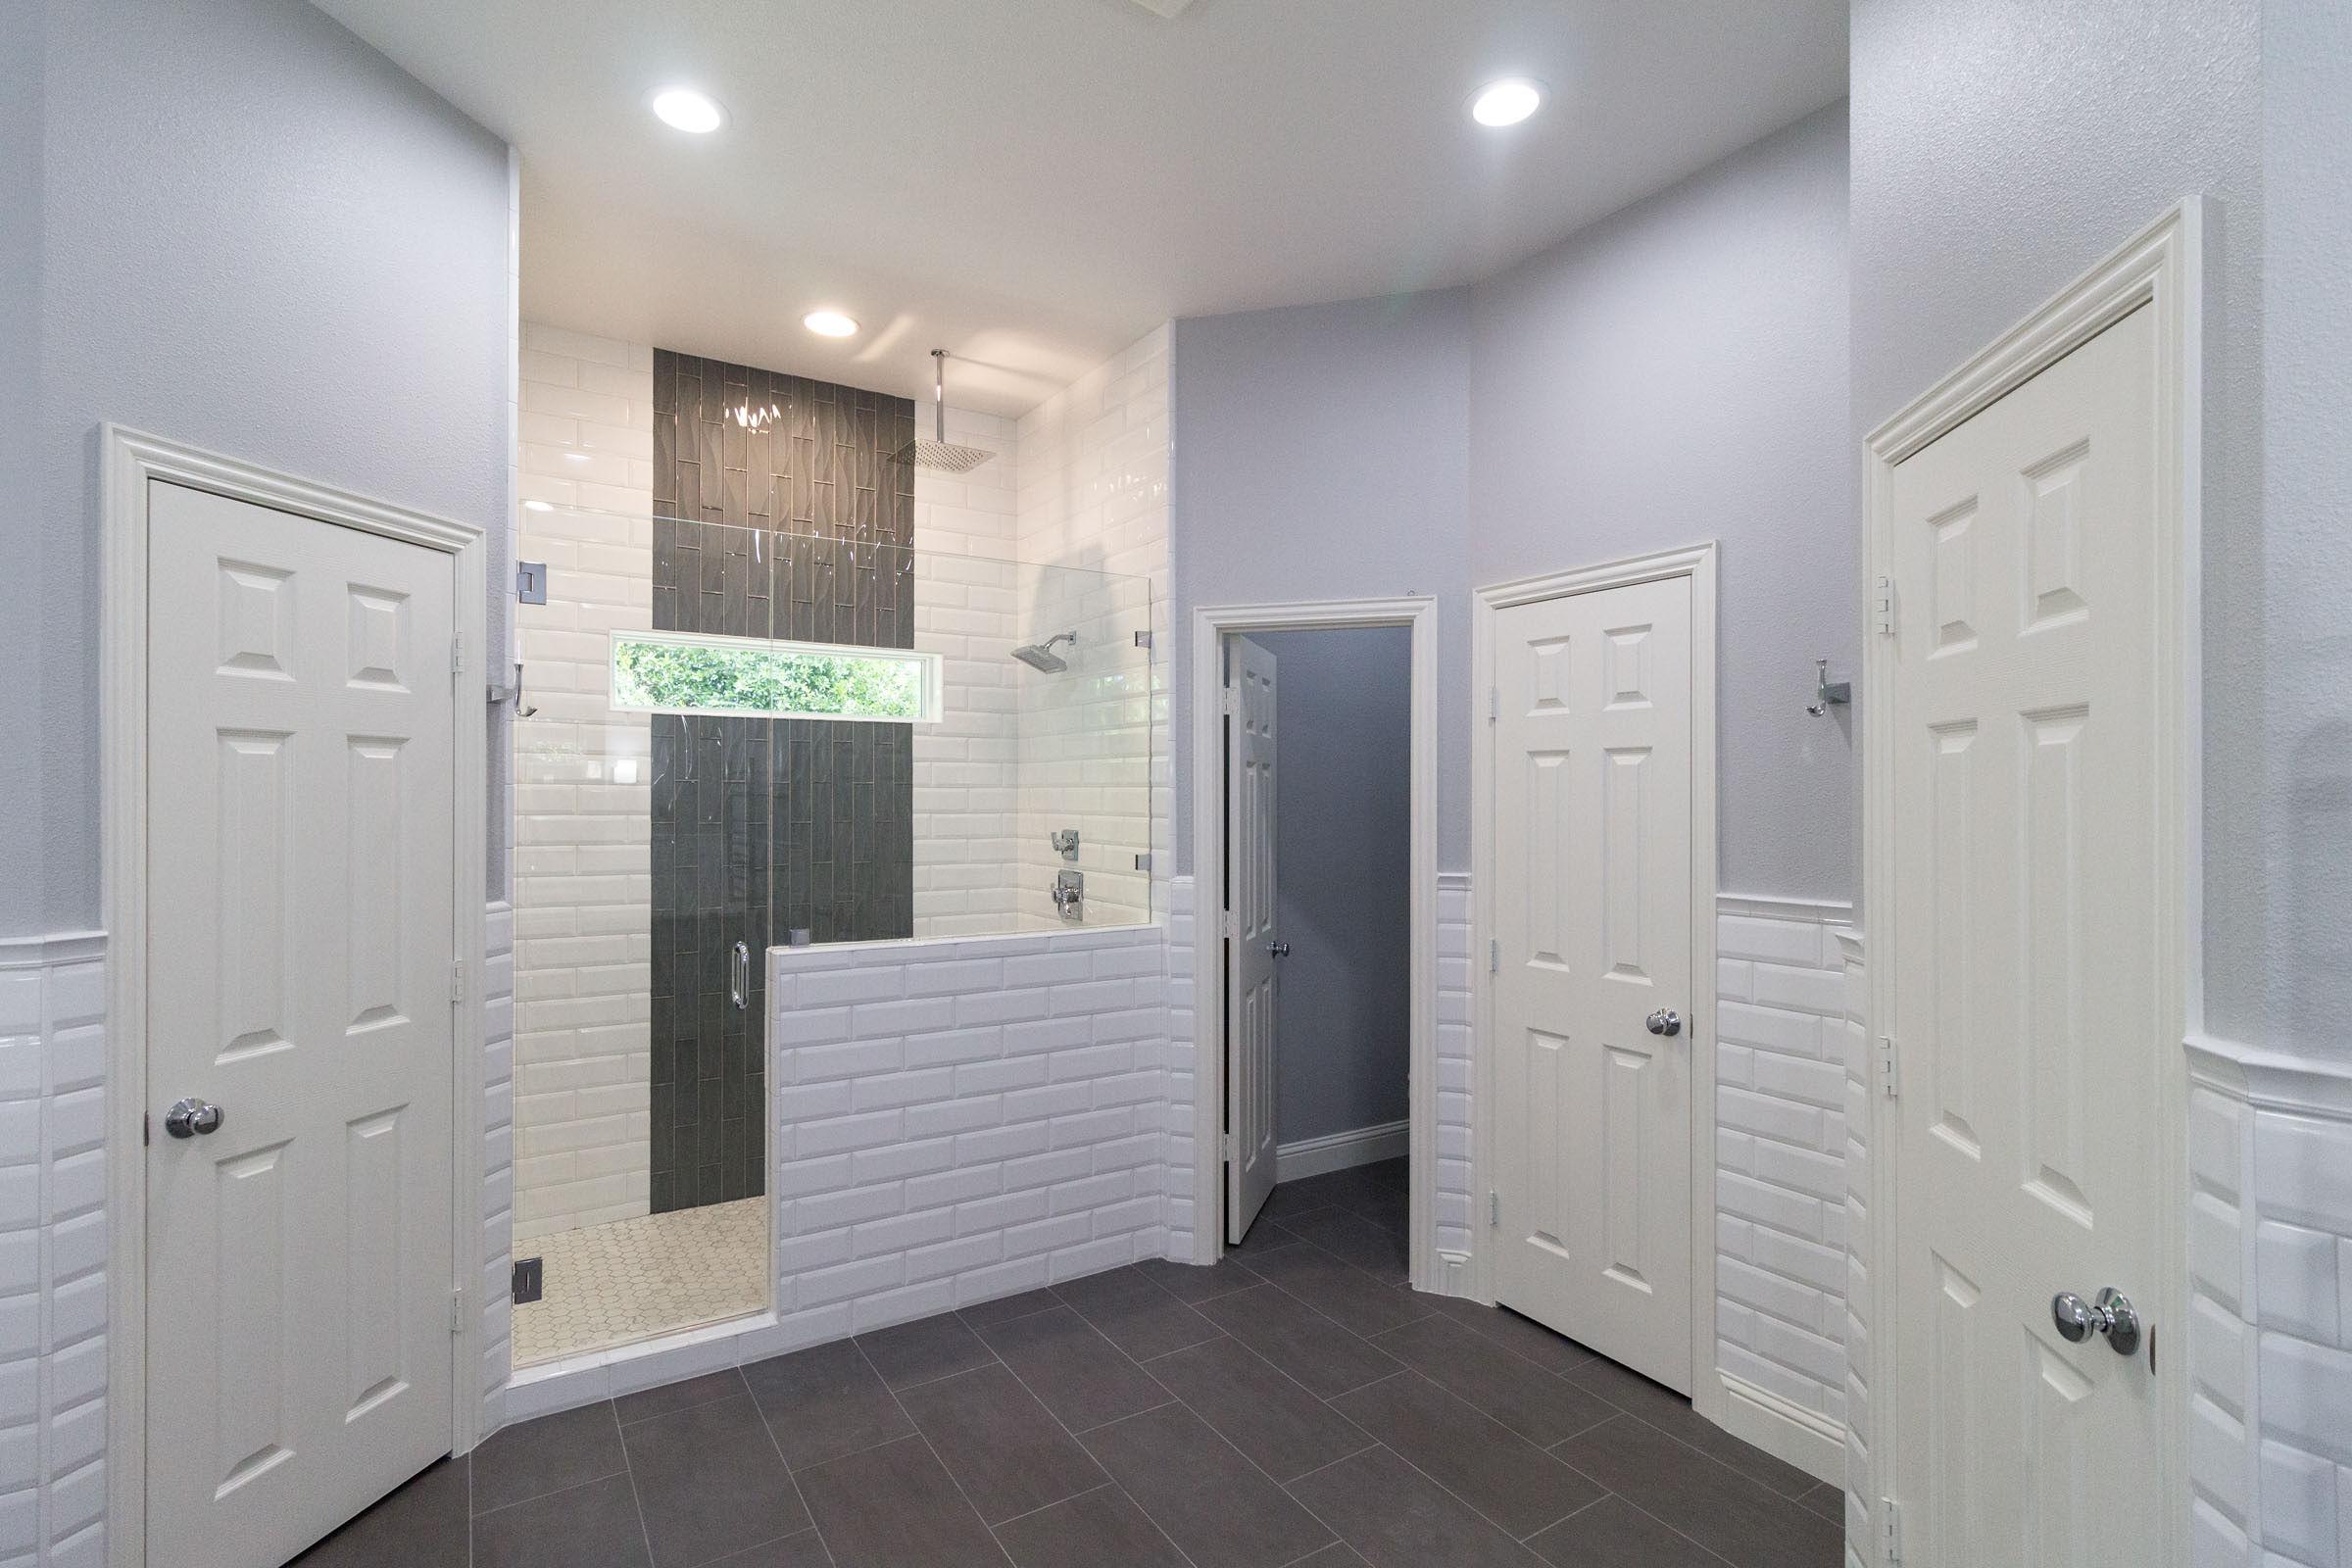 Bathroom remodel with white subway tile, dark grey flooring, walk in shower, open concept